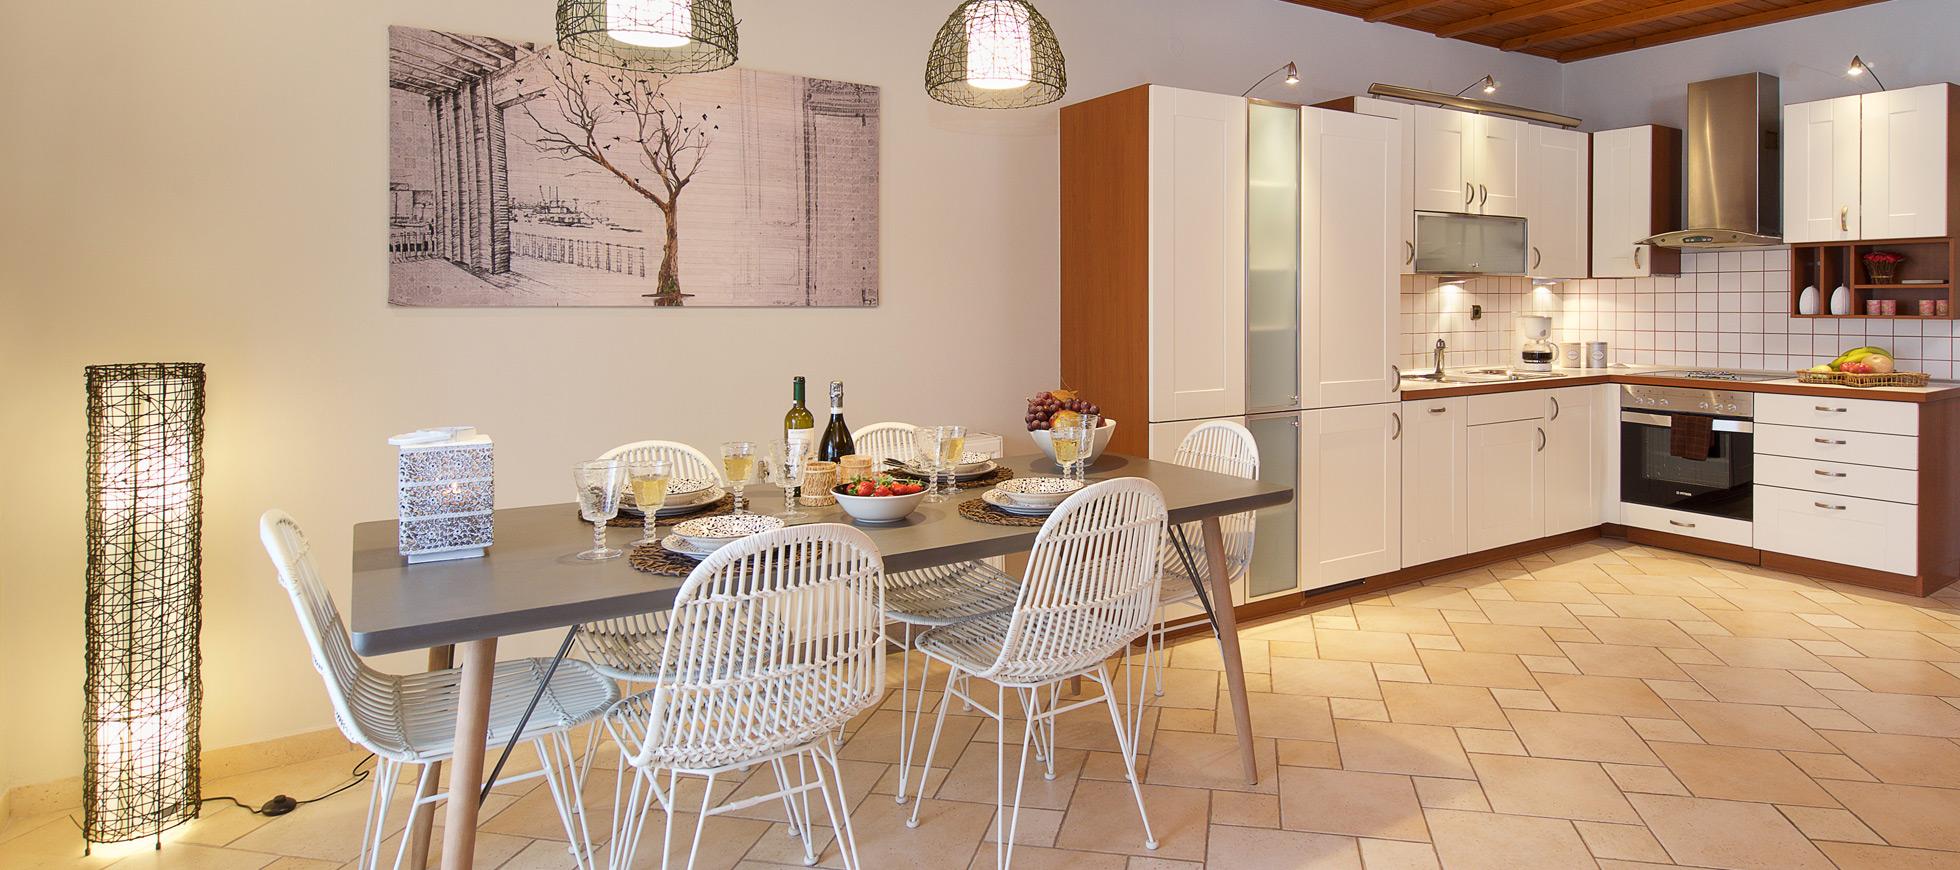 kefalonia_holiday_apartments_02